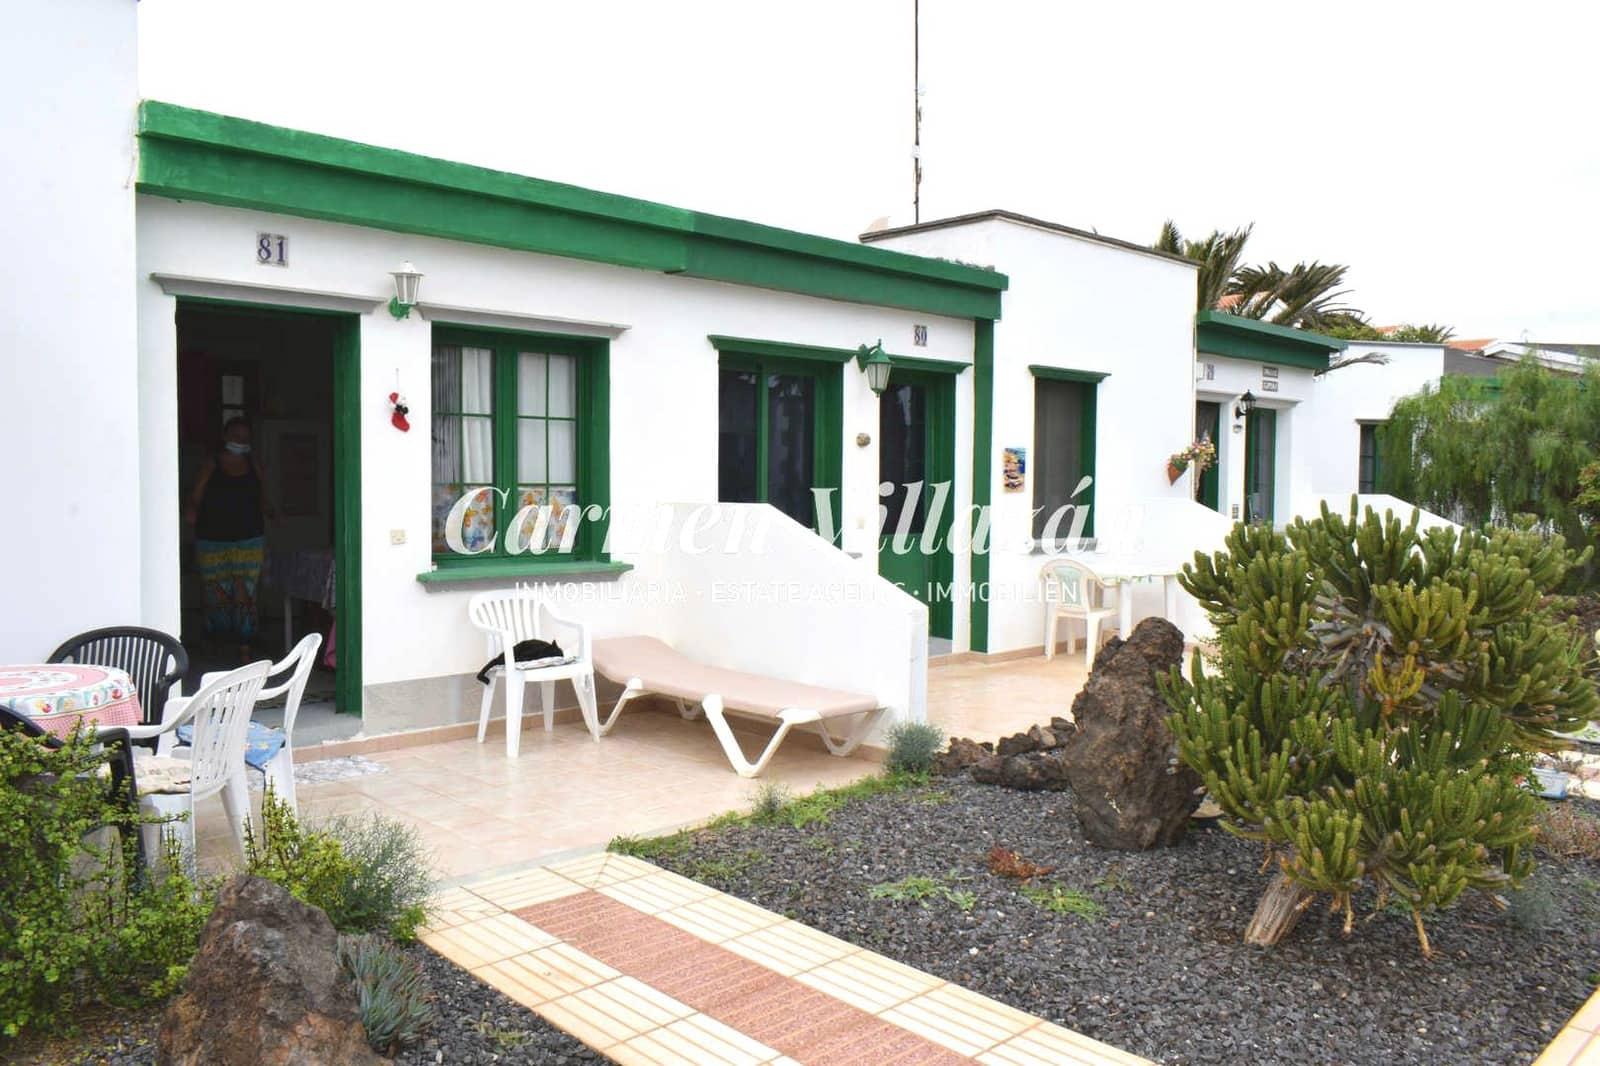 1 sovrum Bungalow till salu i Costa de Antigua med pool - 85 000 € (Ref: 5821710)